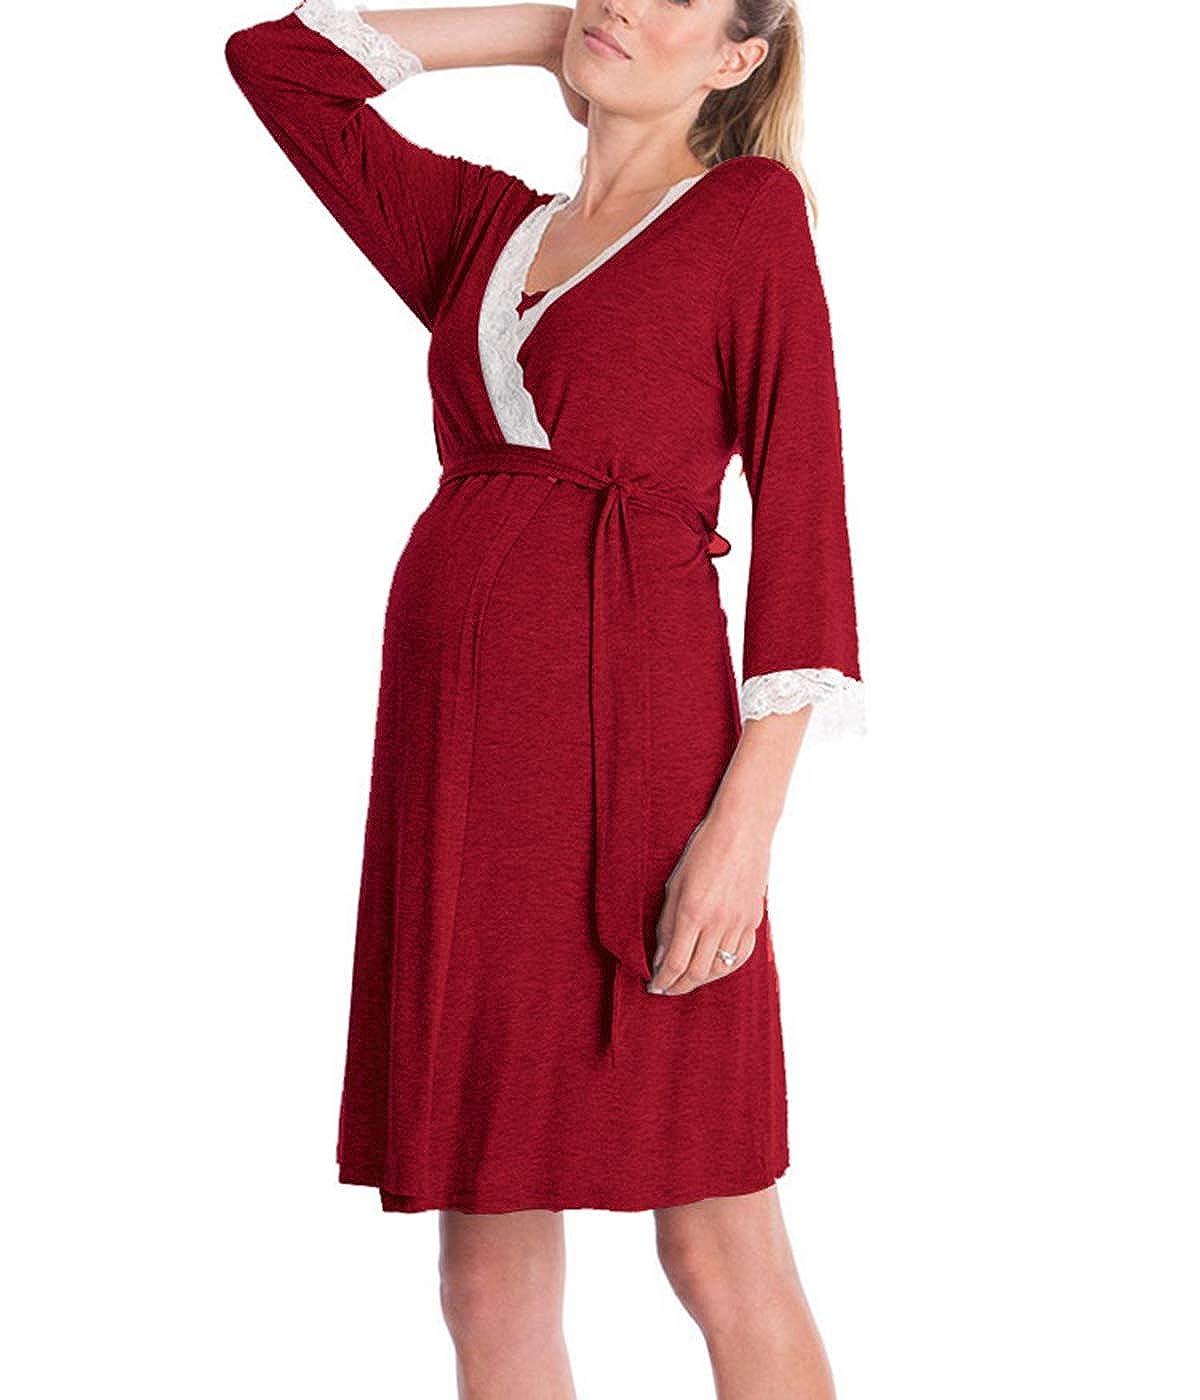 D C.Supernice Women Nightdress 3//4 Sleeve V-Neck Maternity Nursing Nightie Dress for Breastfeeding Nightgown Sleepwear